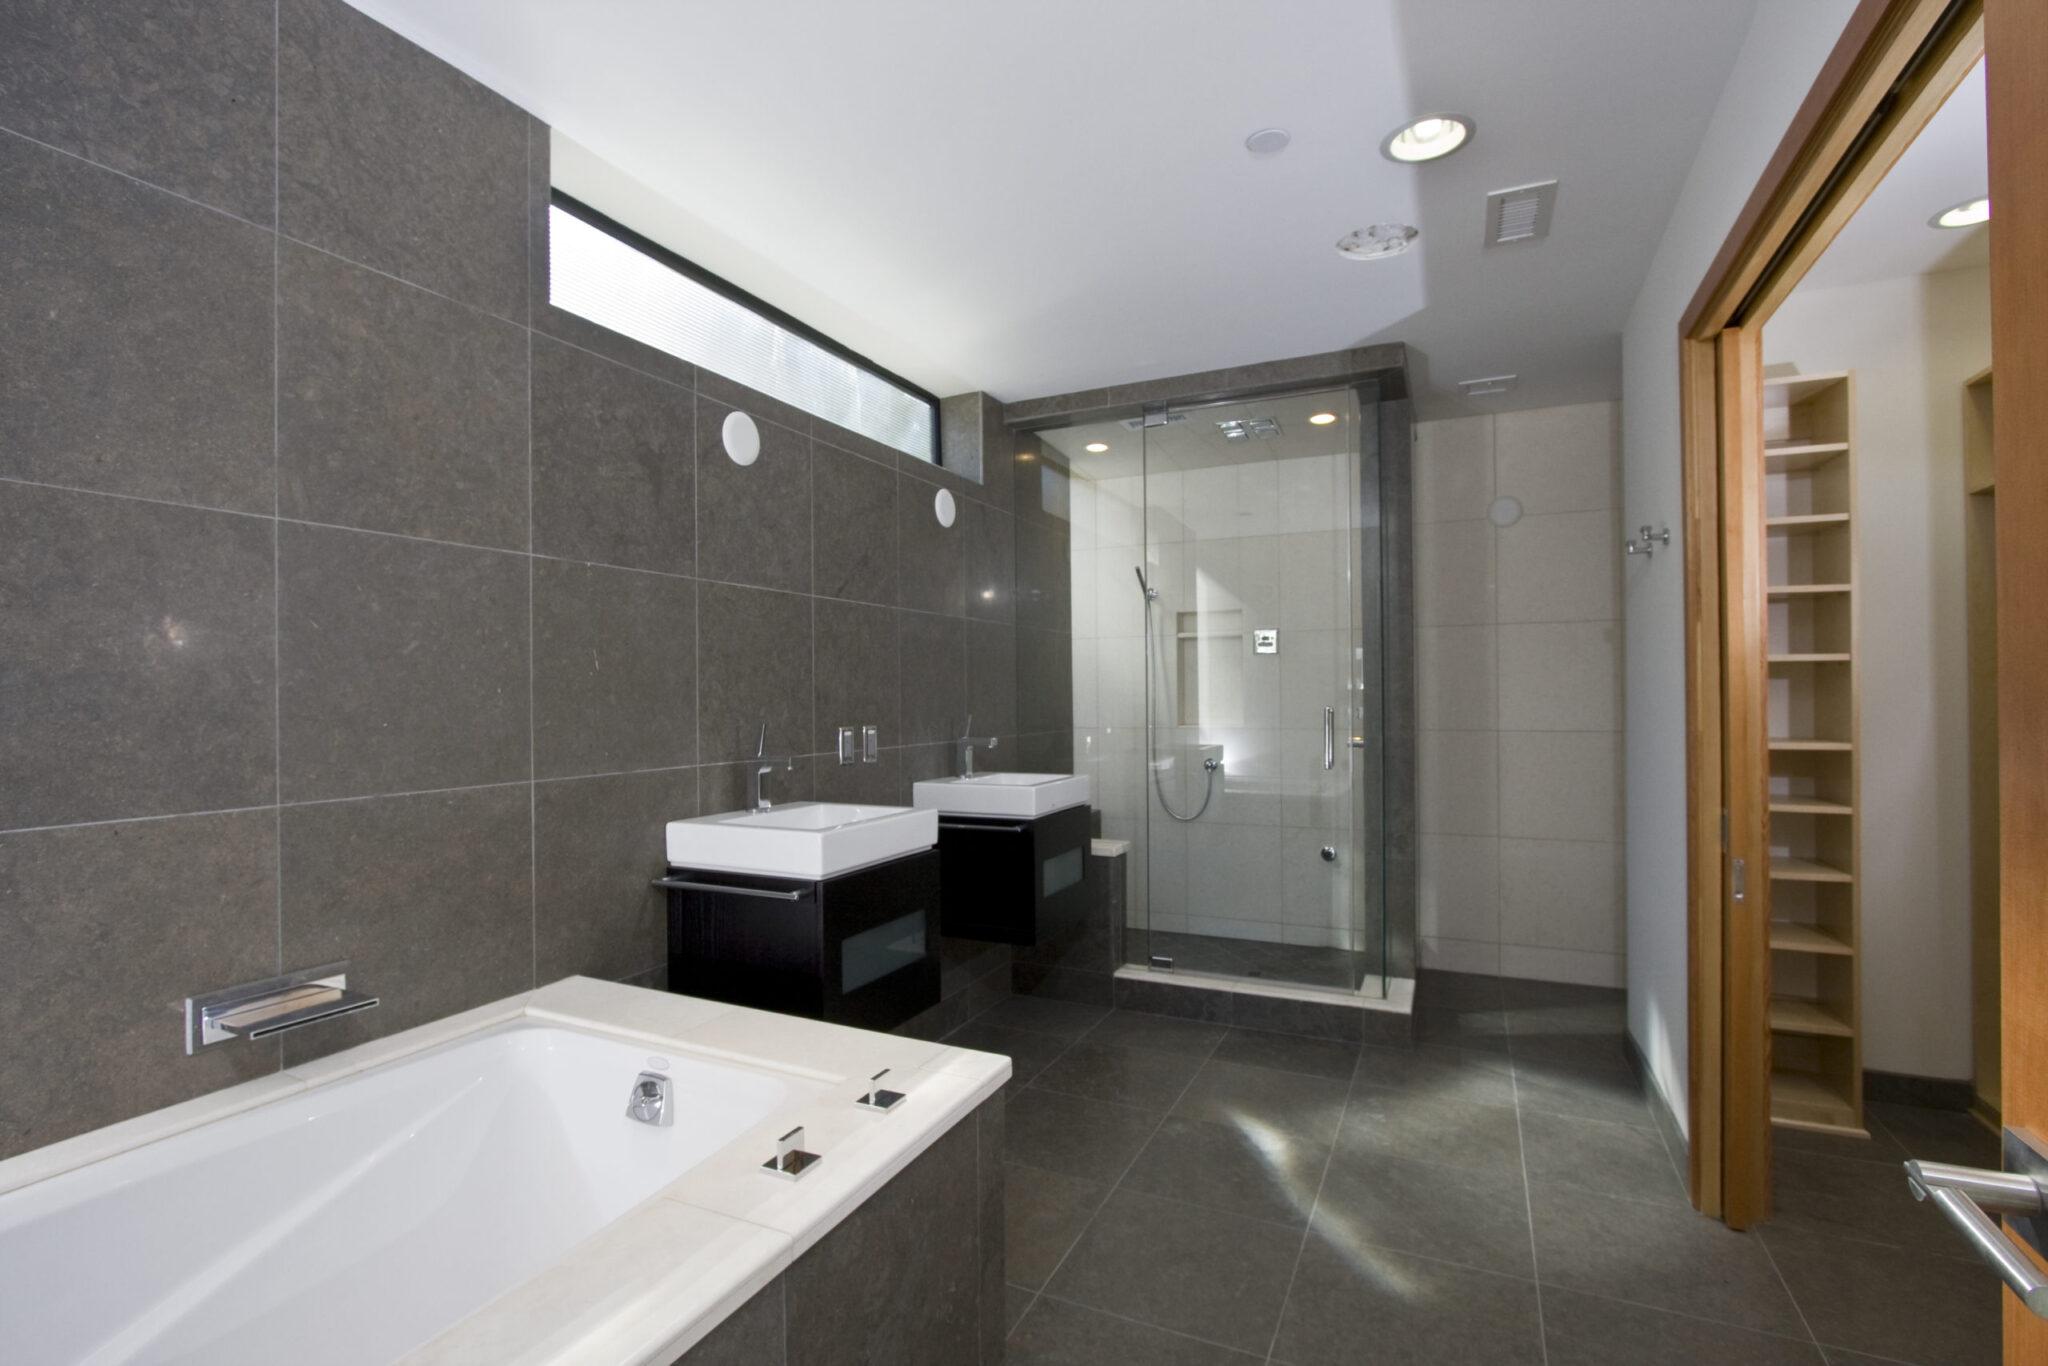 Bathroom Remodel Orange County